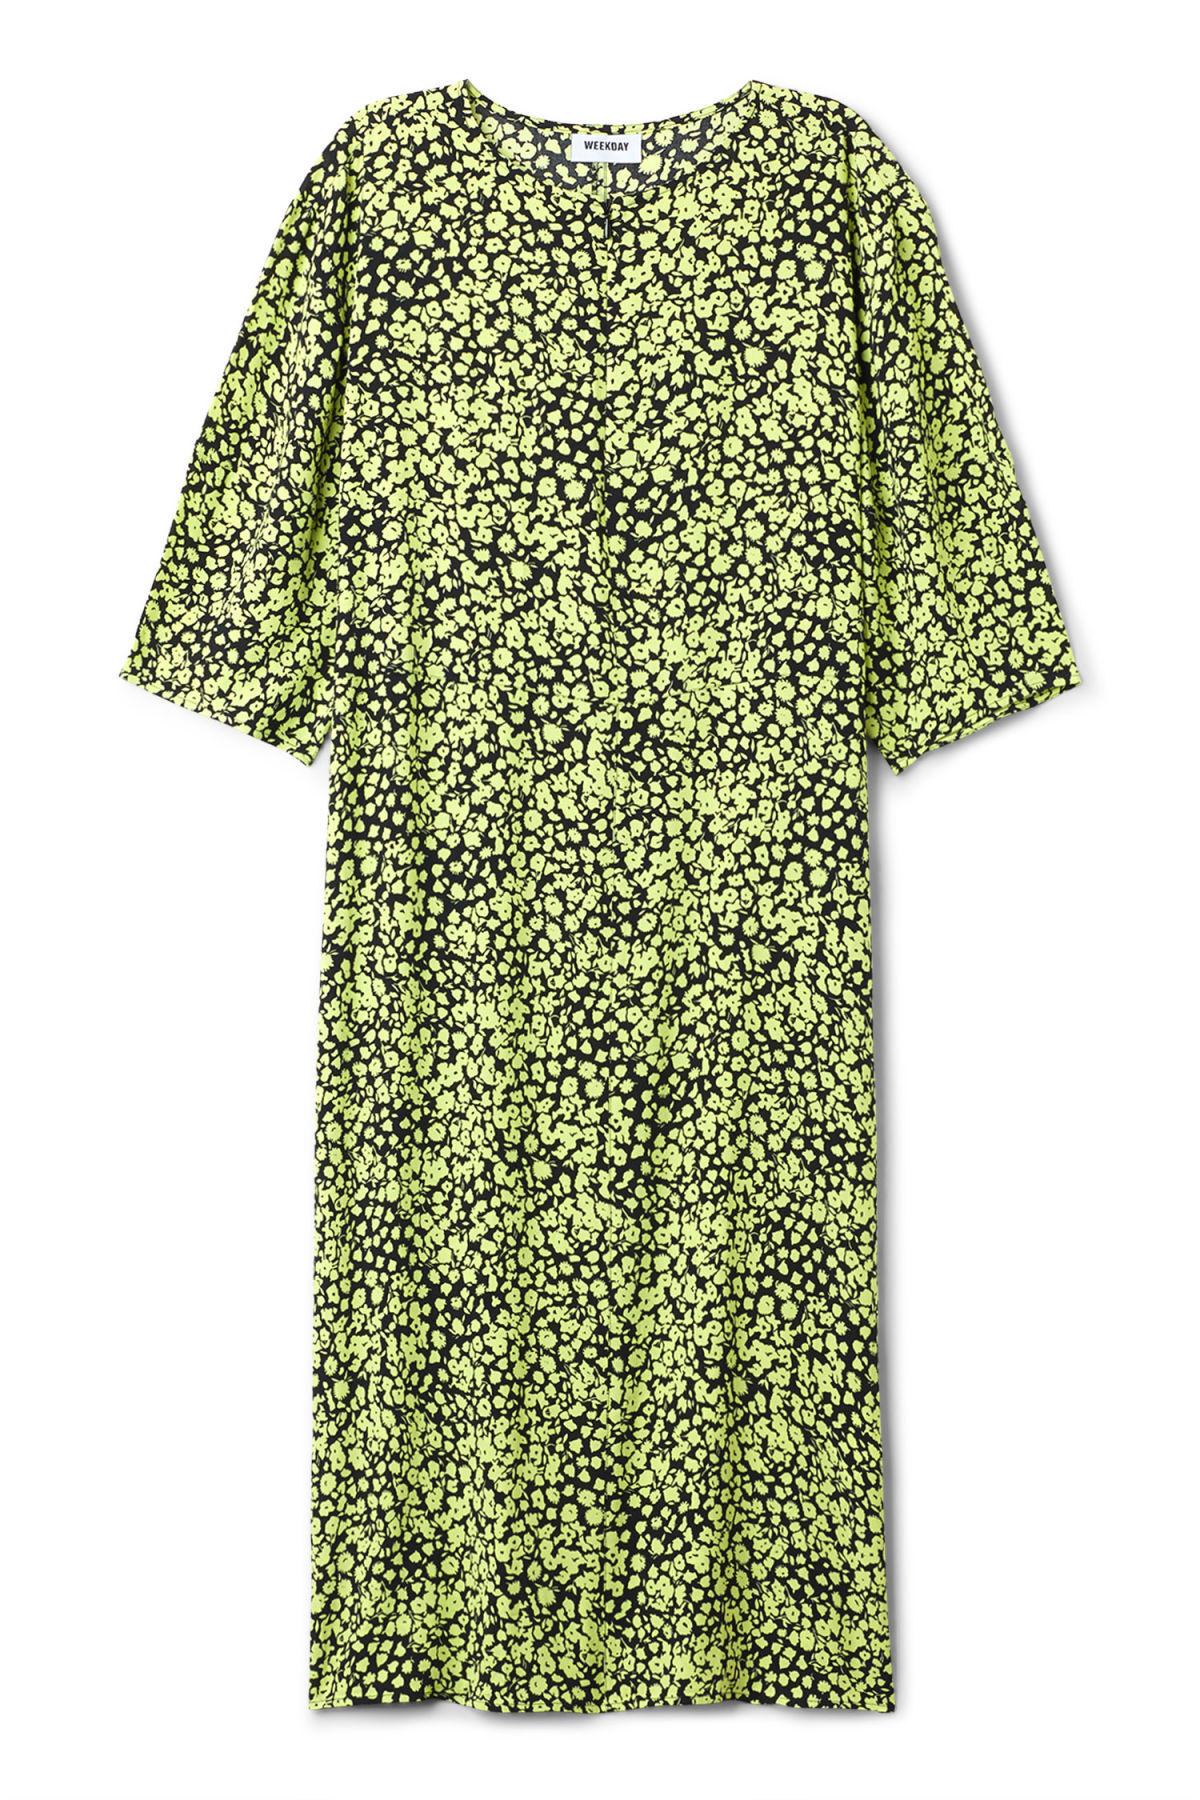 Image of Cara Dress - Yellow-XS